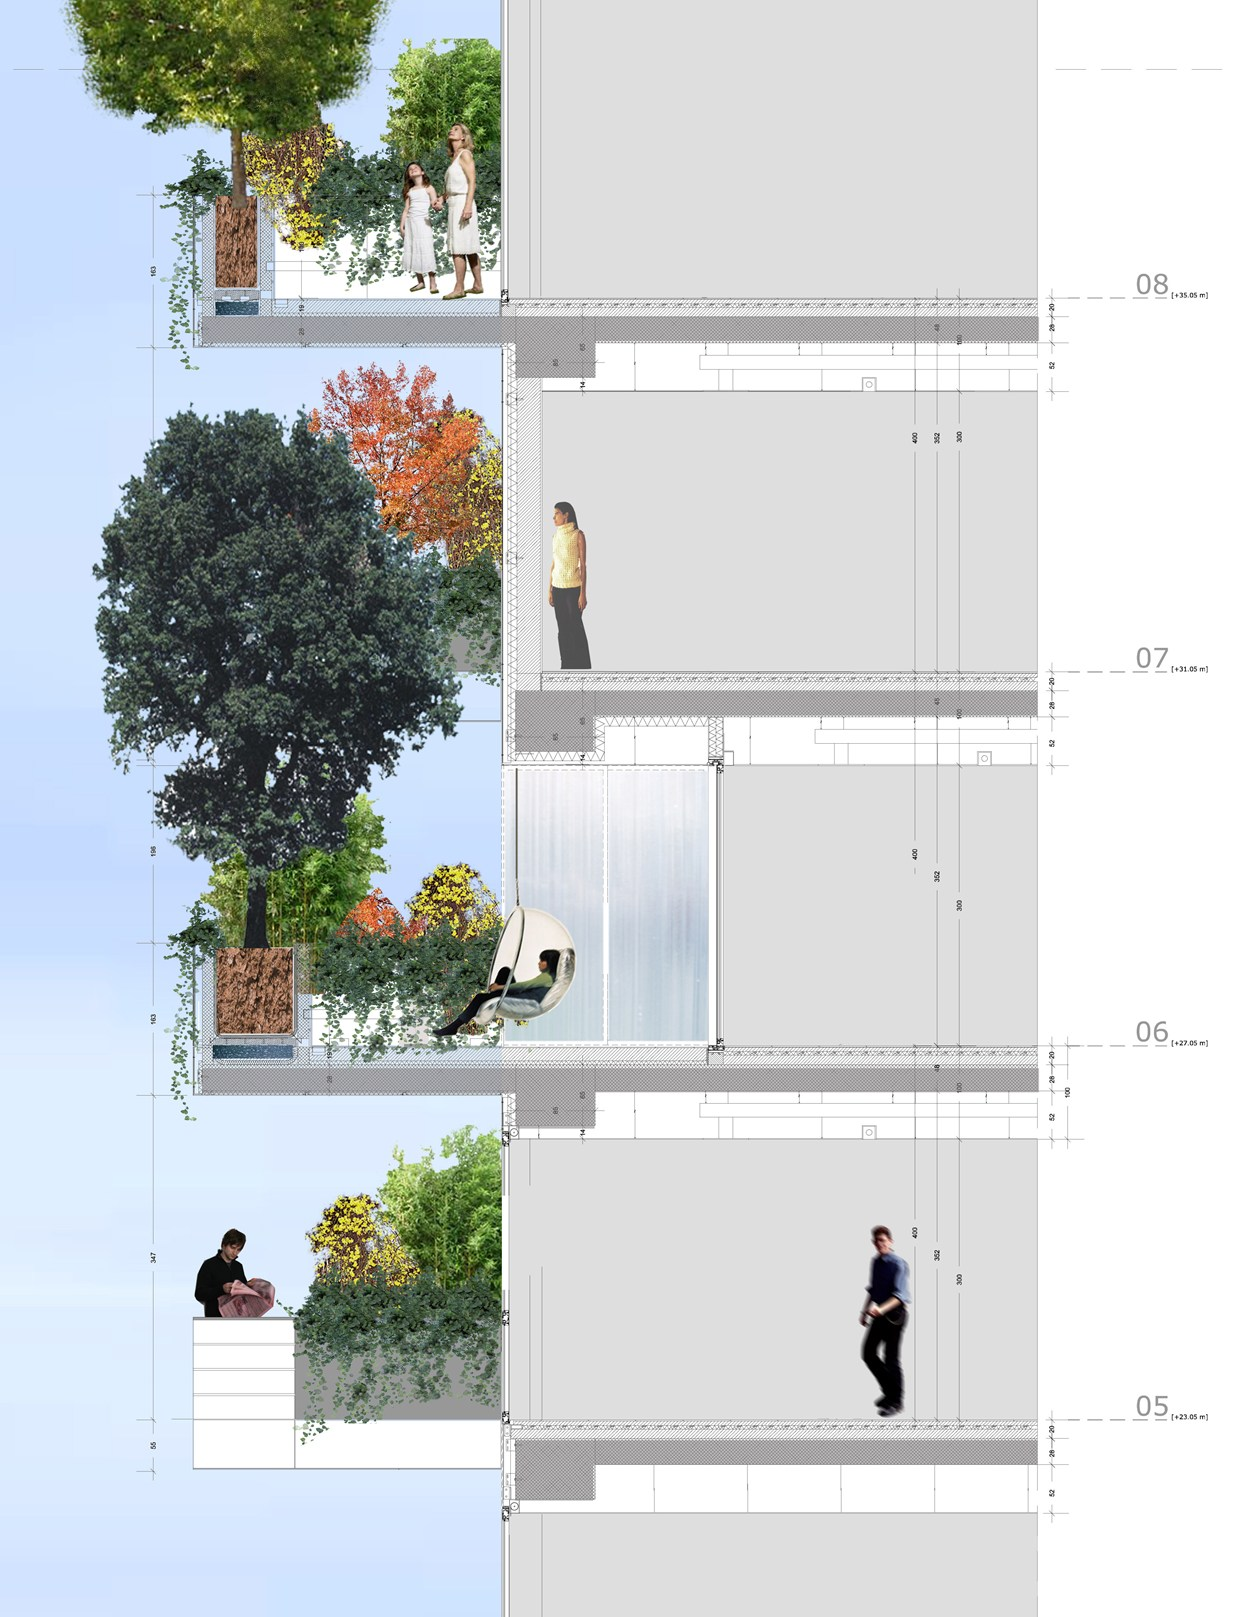 bosco-verticale-archiportale-34865_09